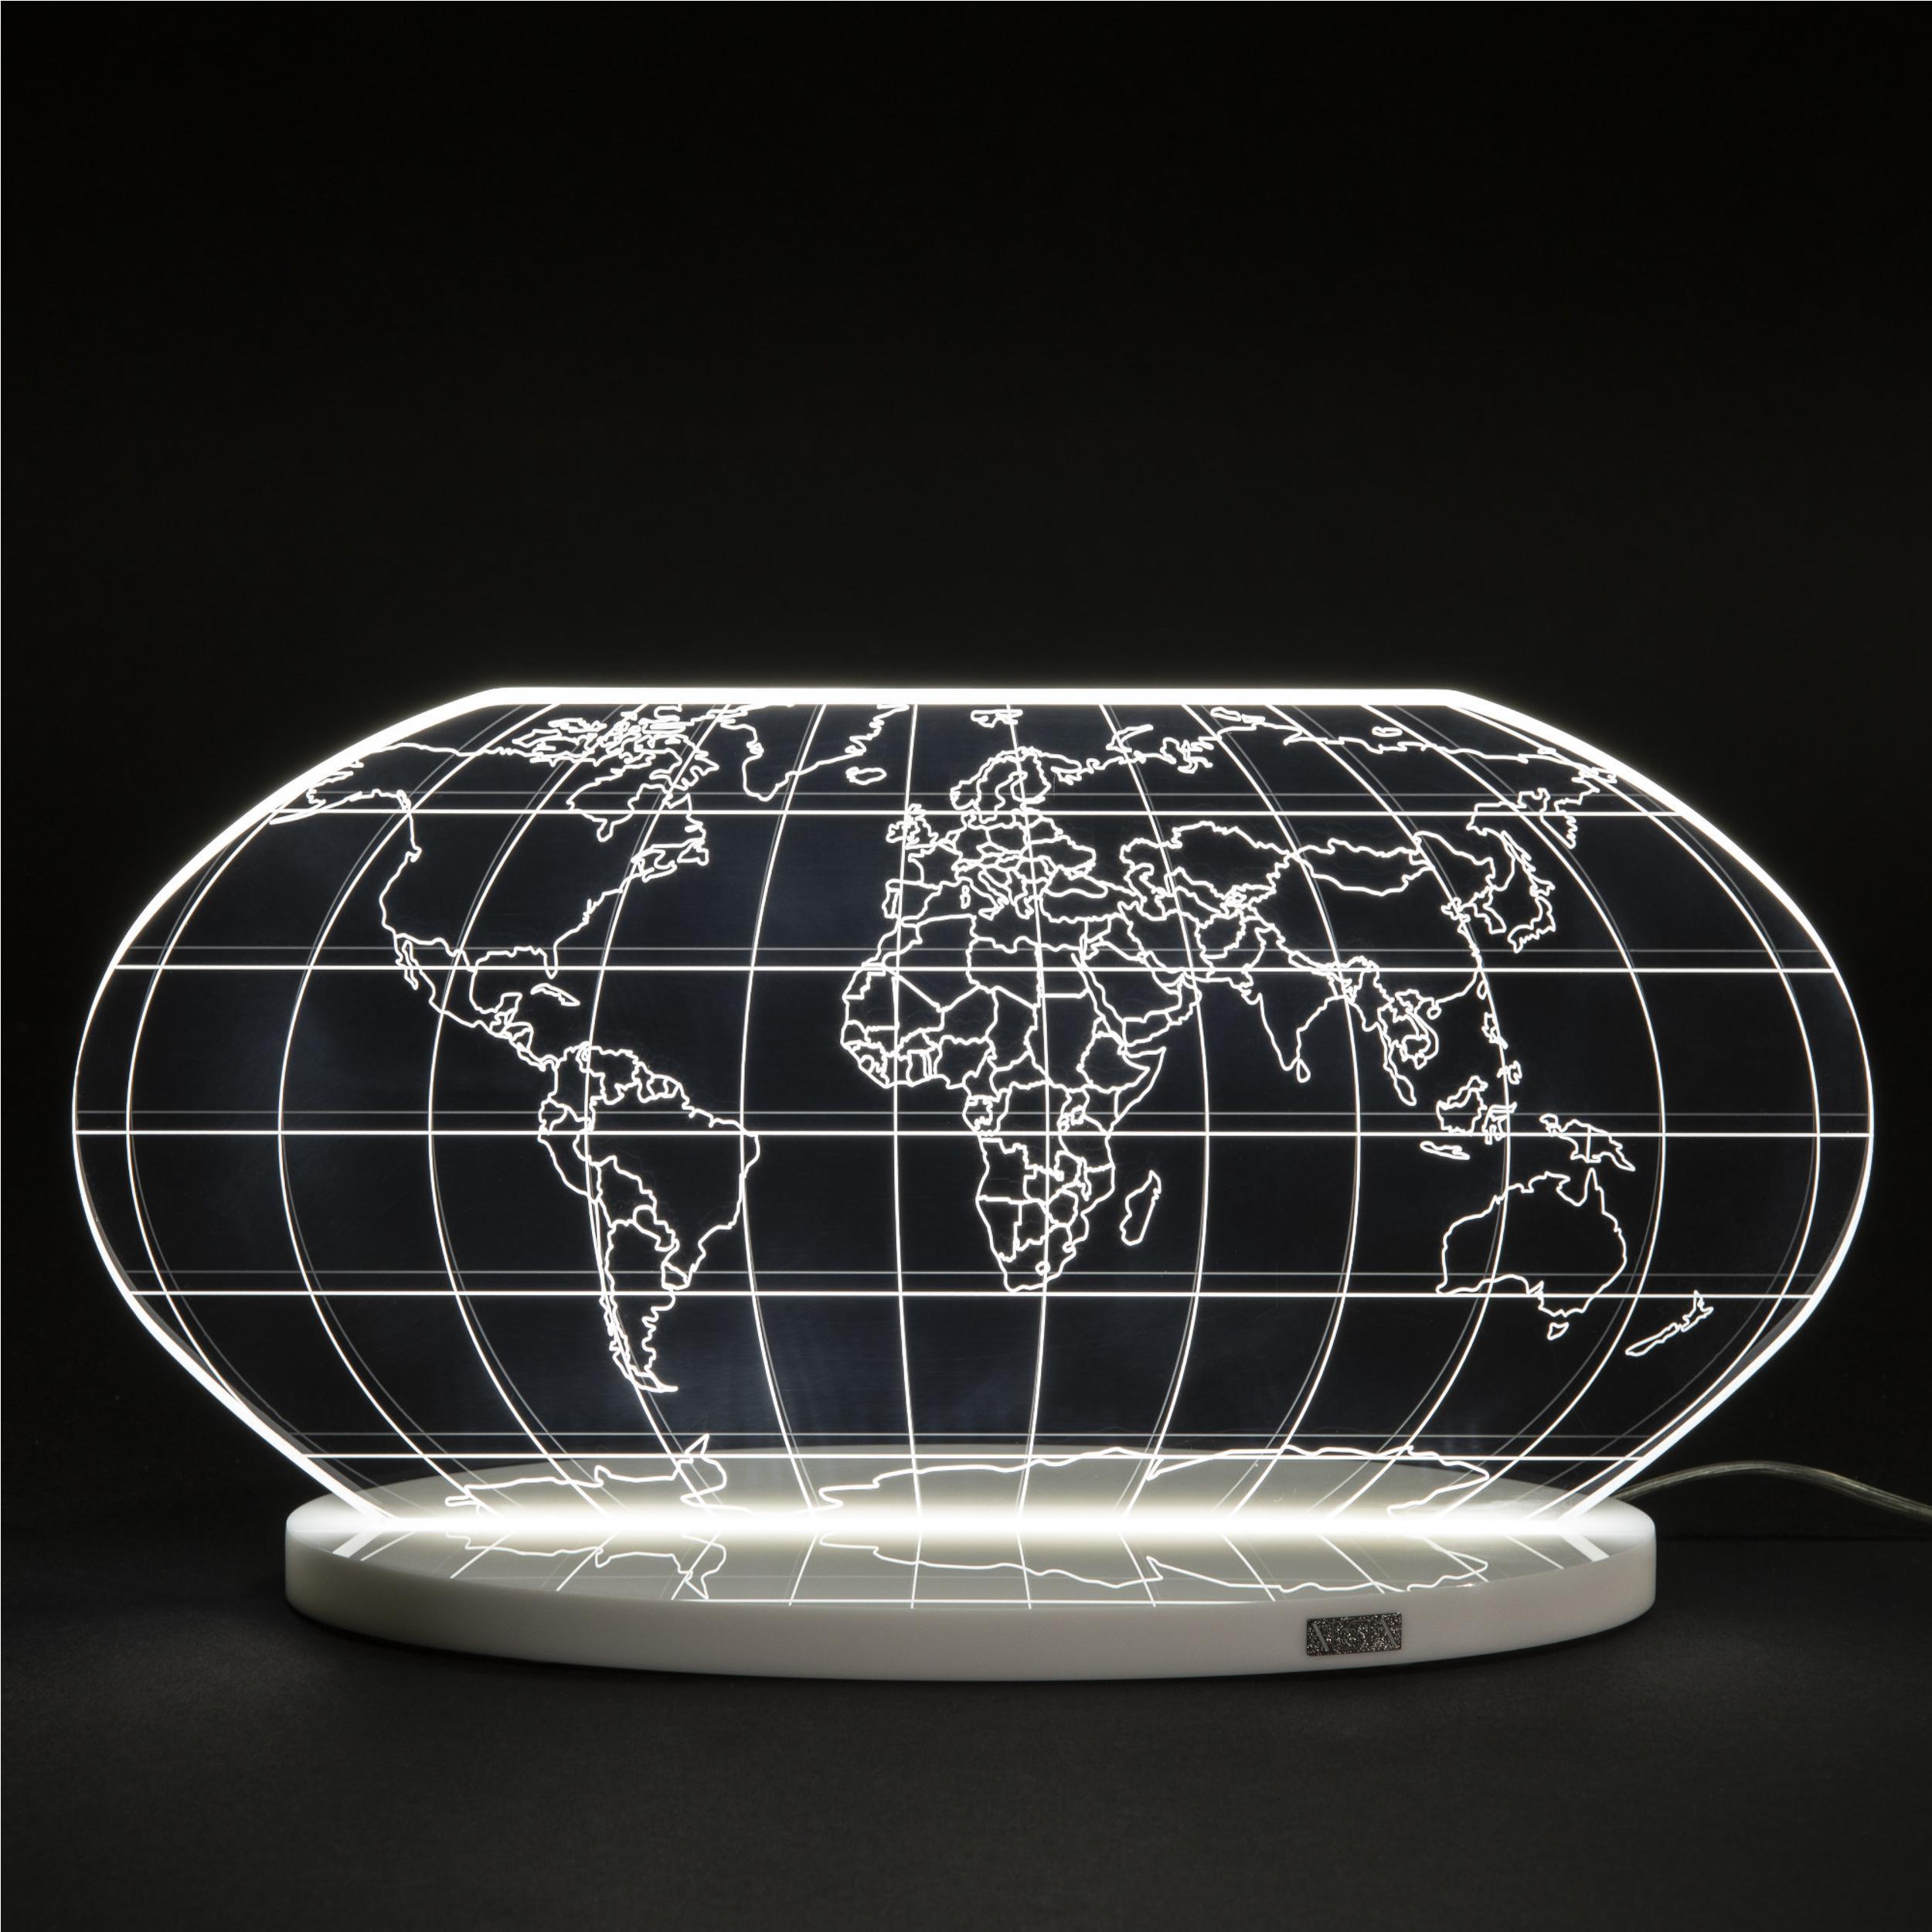 Lampada da tavolo COLOMBO LUXURY in